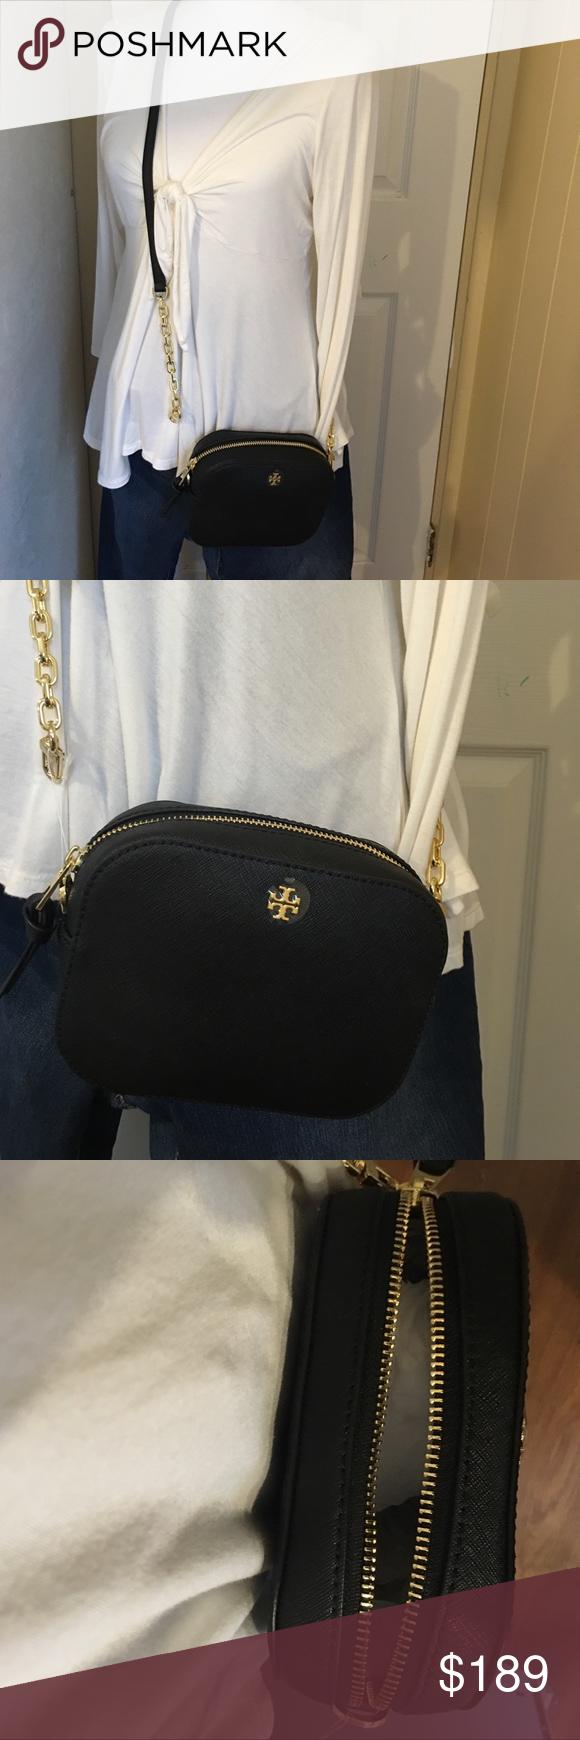 7174574b41b Tory Burch Robinson round crossbody bag Brand new crossbody bag. Black  color. Saffiano leather. Tory Burch Bags Crossbody Bags